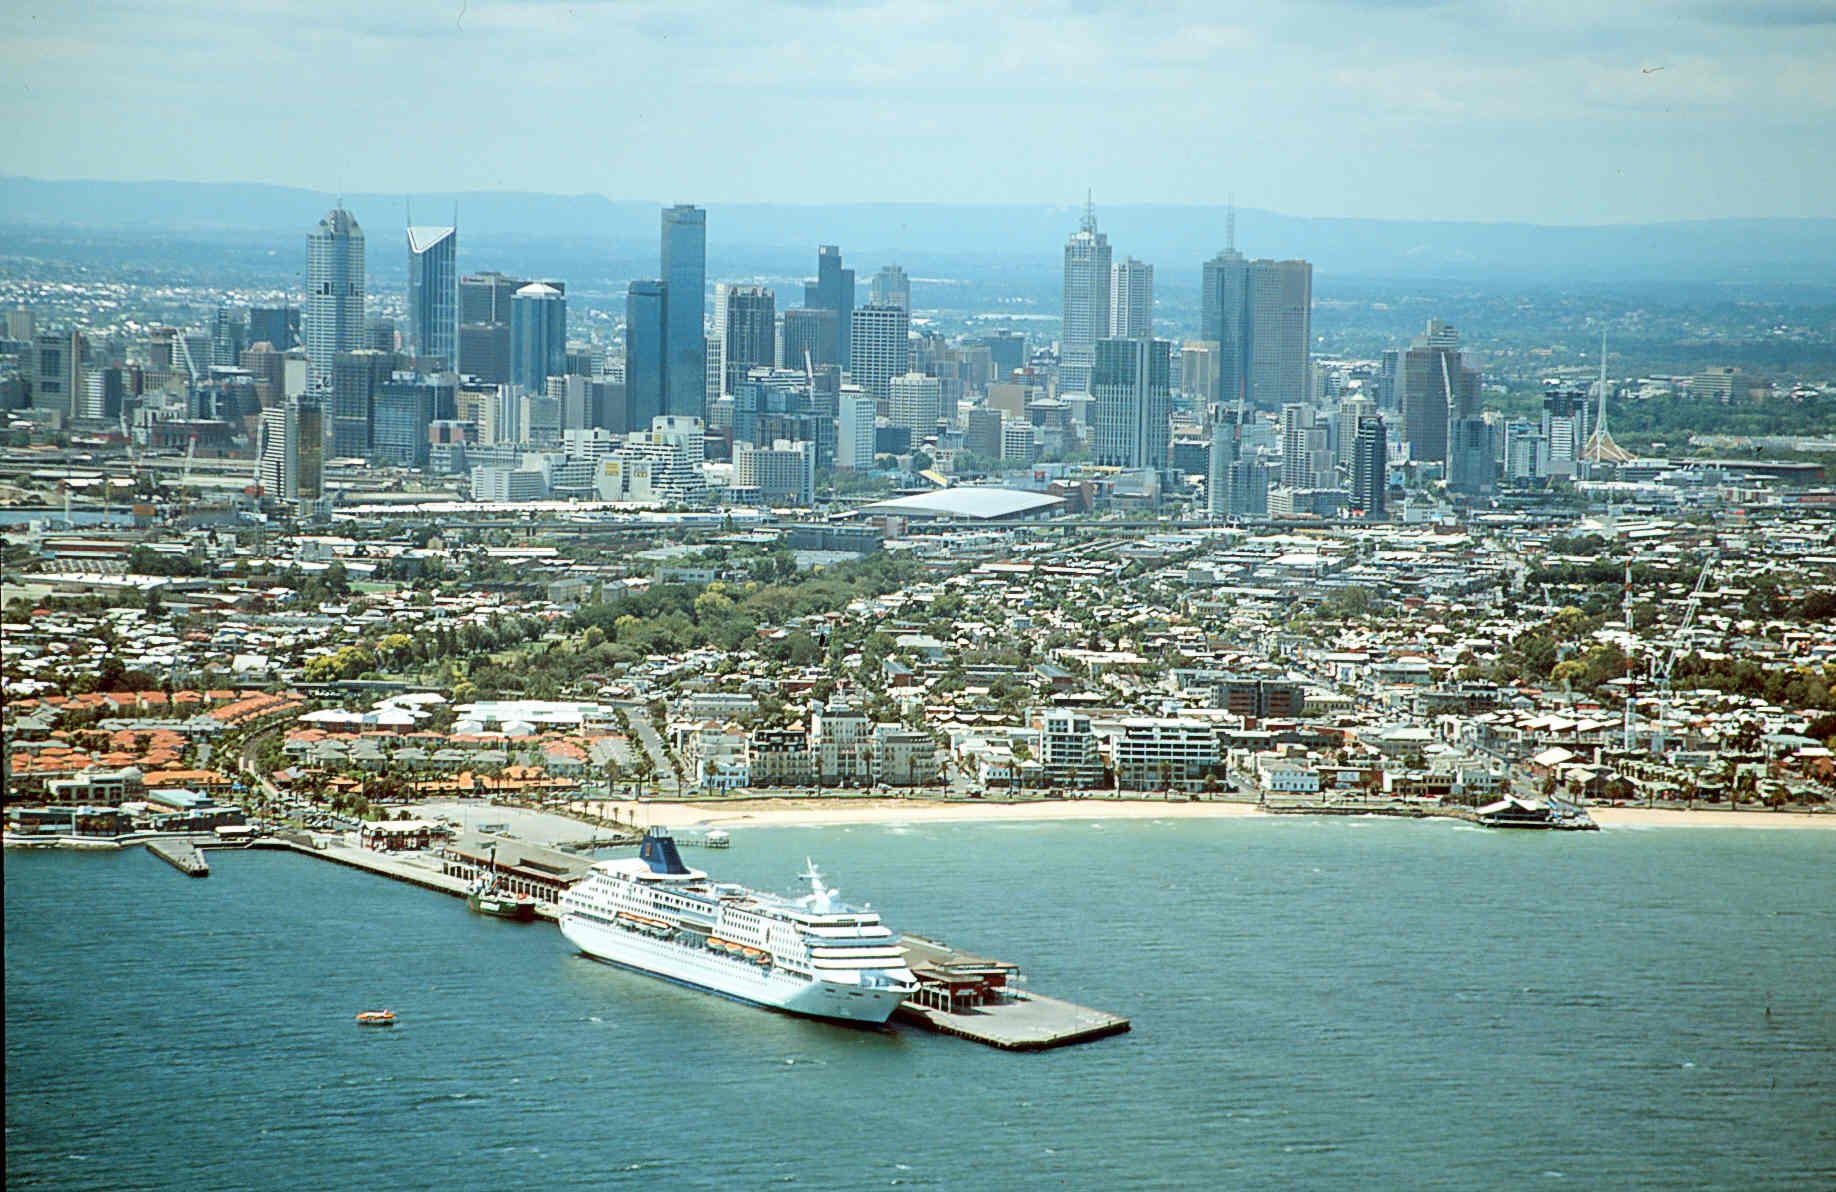 Aerial view Melbourne skyline, Victoria australia